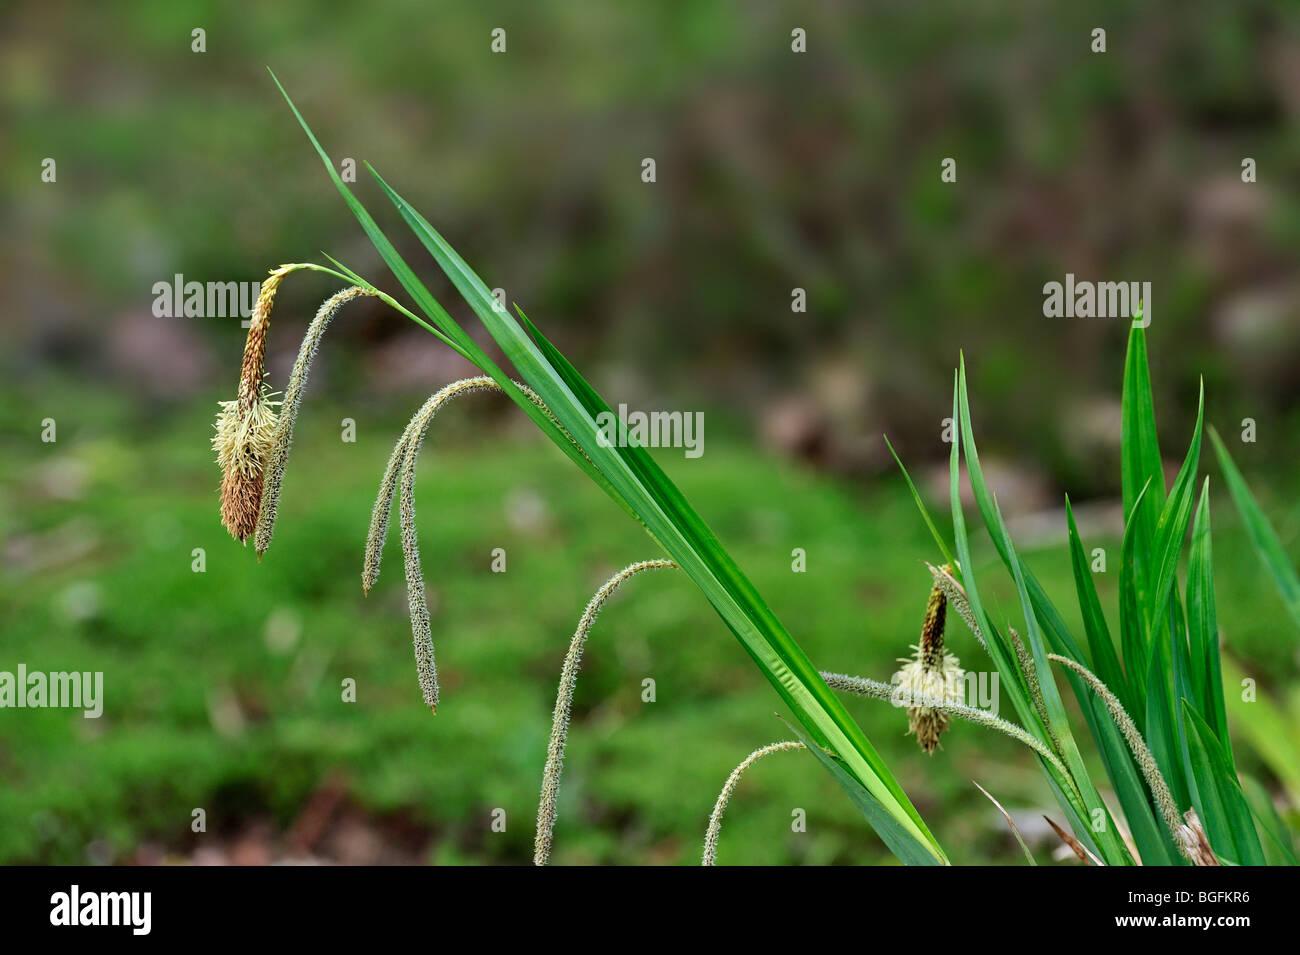 Pendulous sedge / Hanging sedge / Drooping sedge / Weeping sedge (Carex pendula), Germany - Stock Image